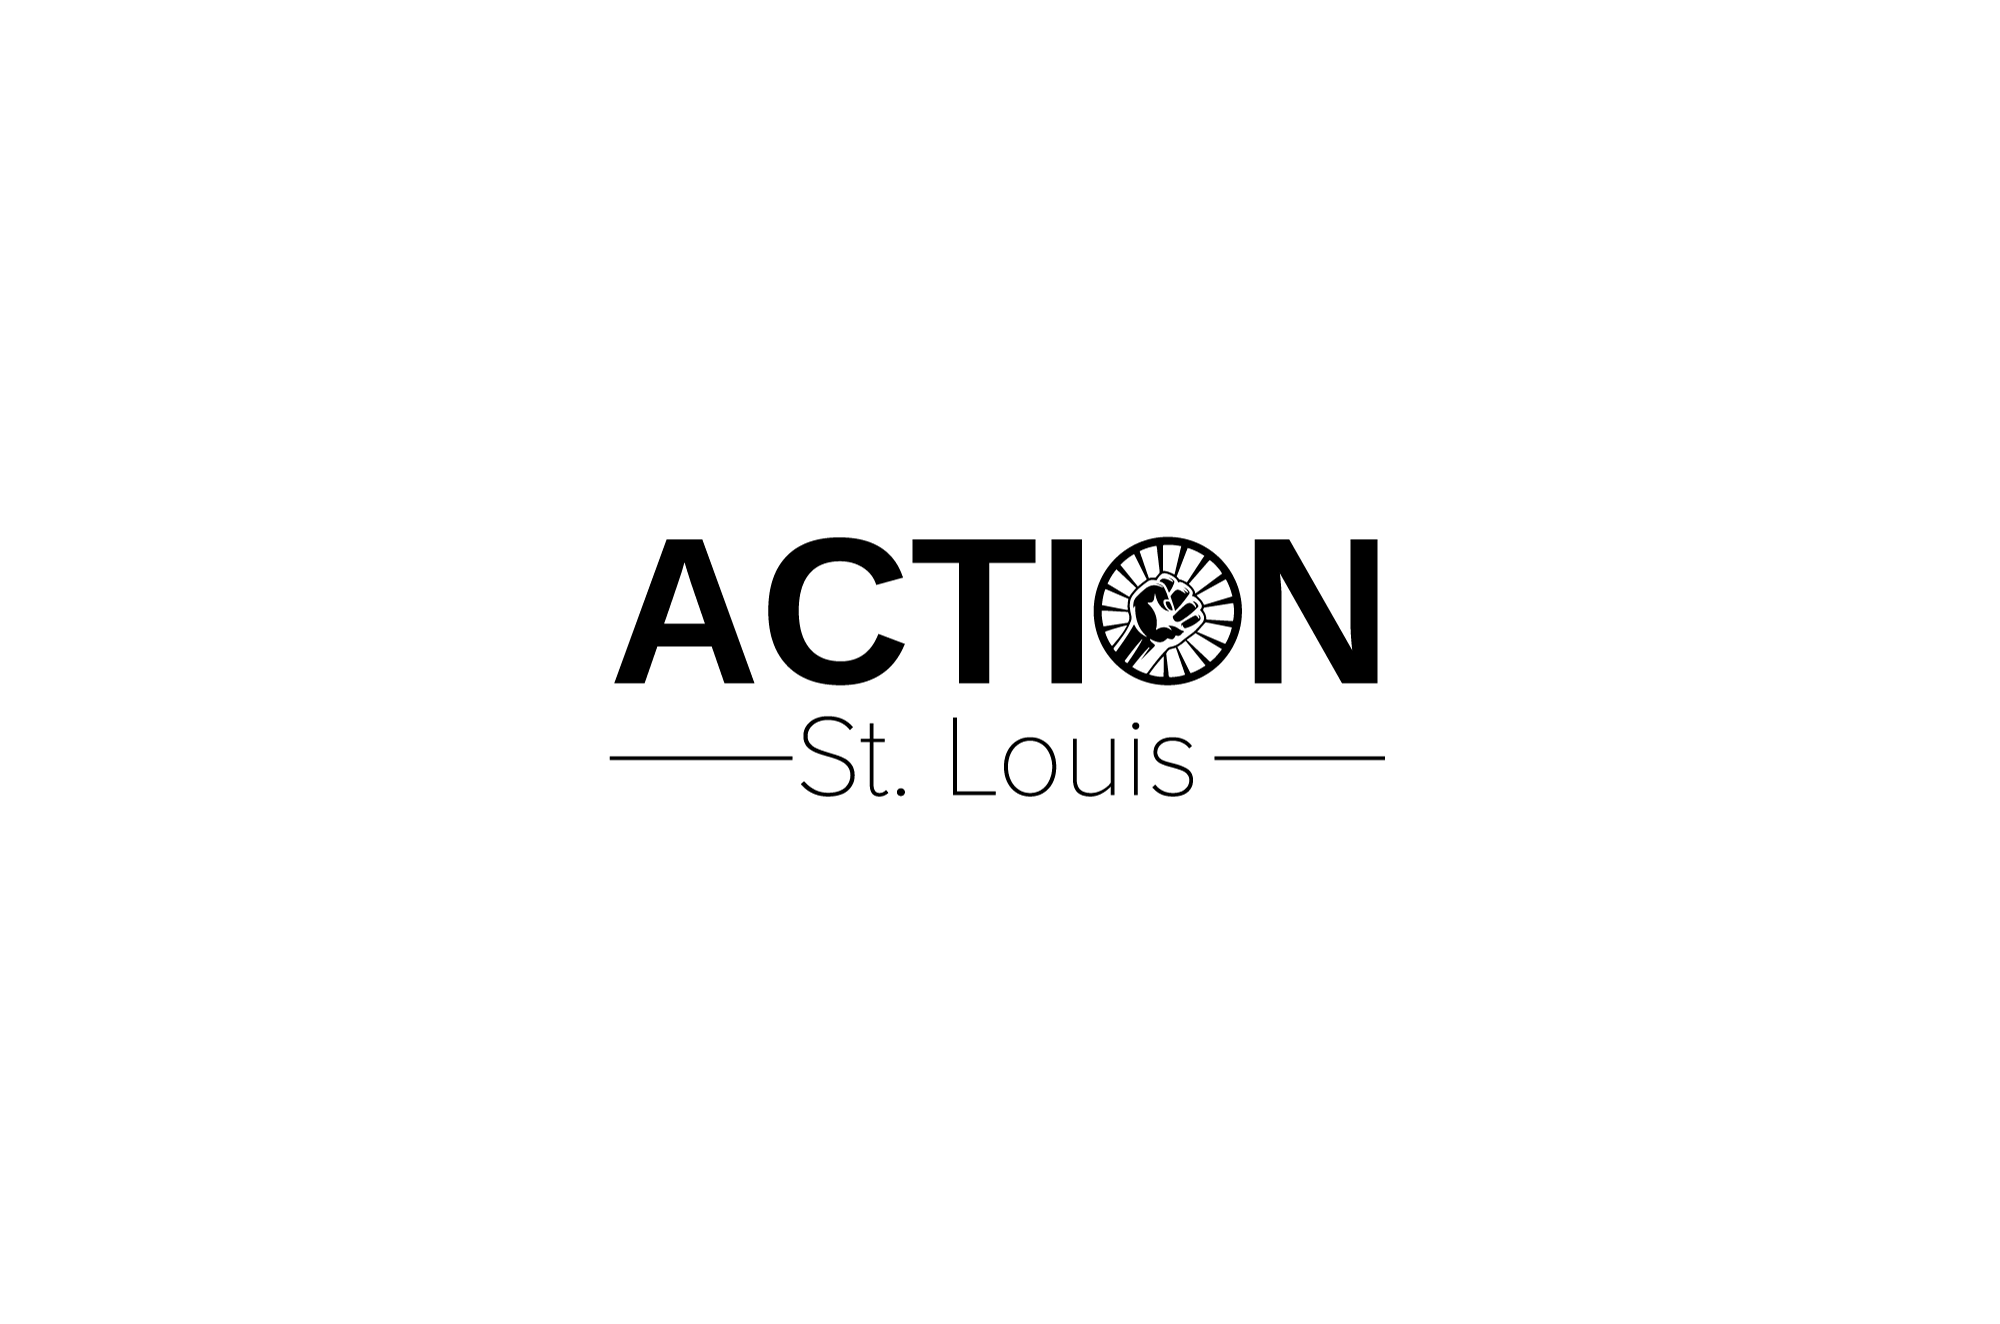 ActionSTL(no arch)transparent.png